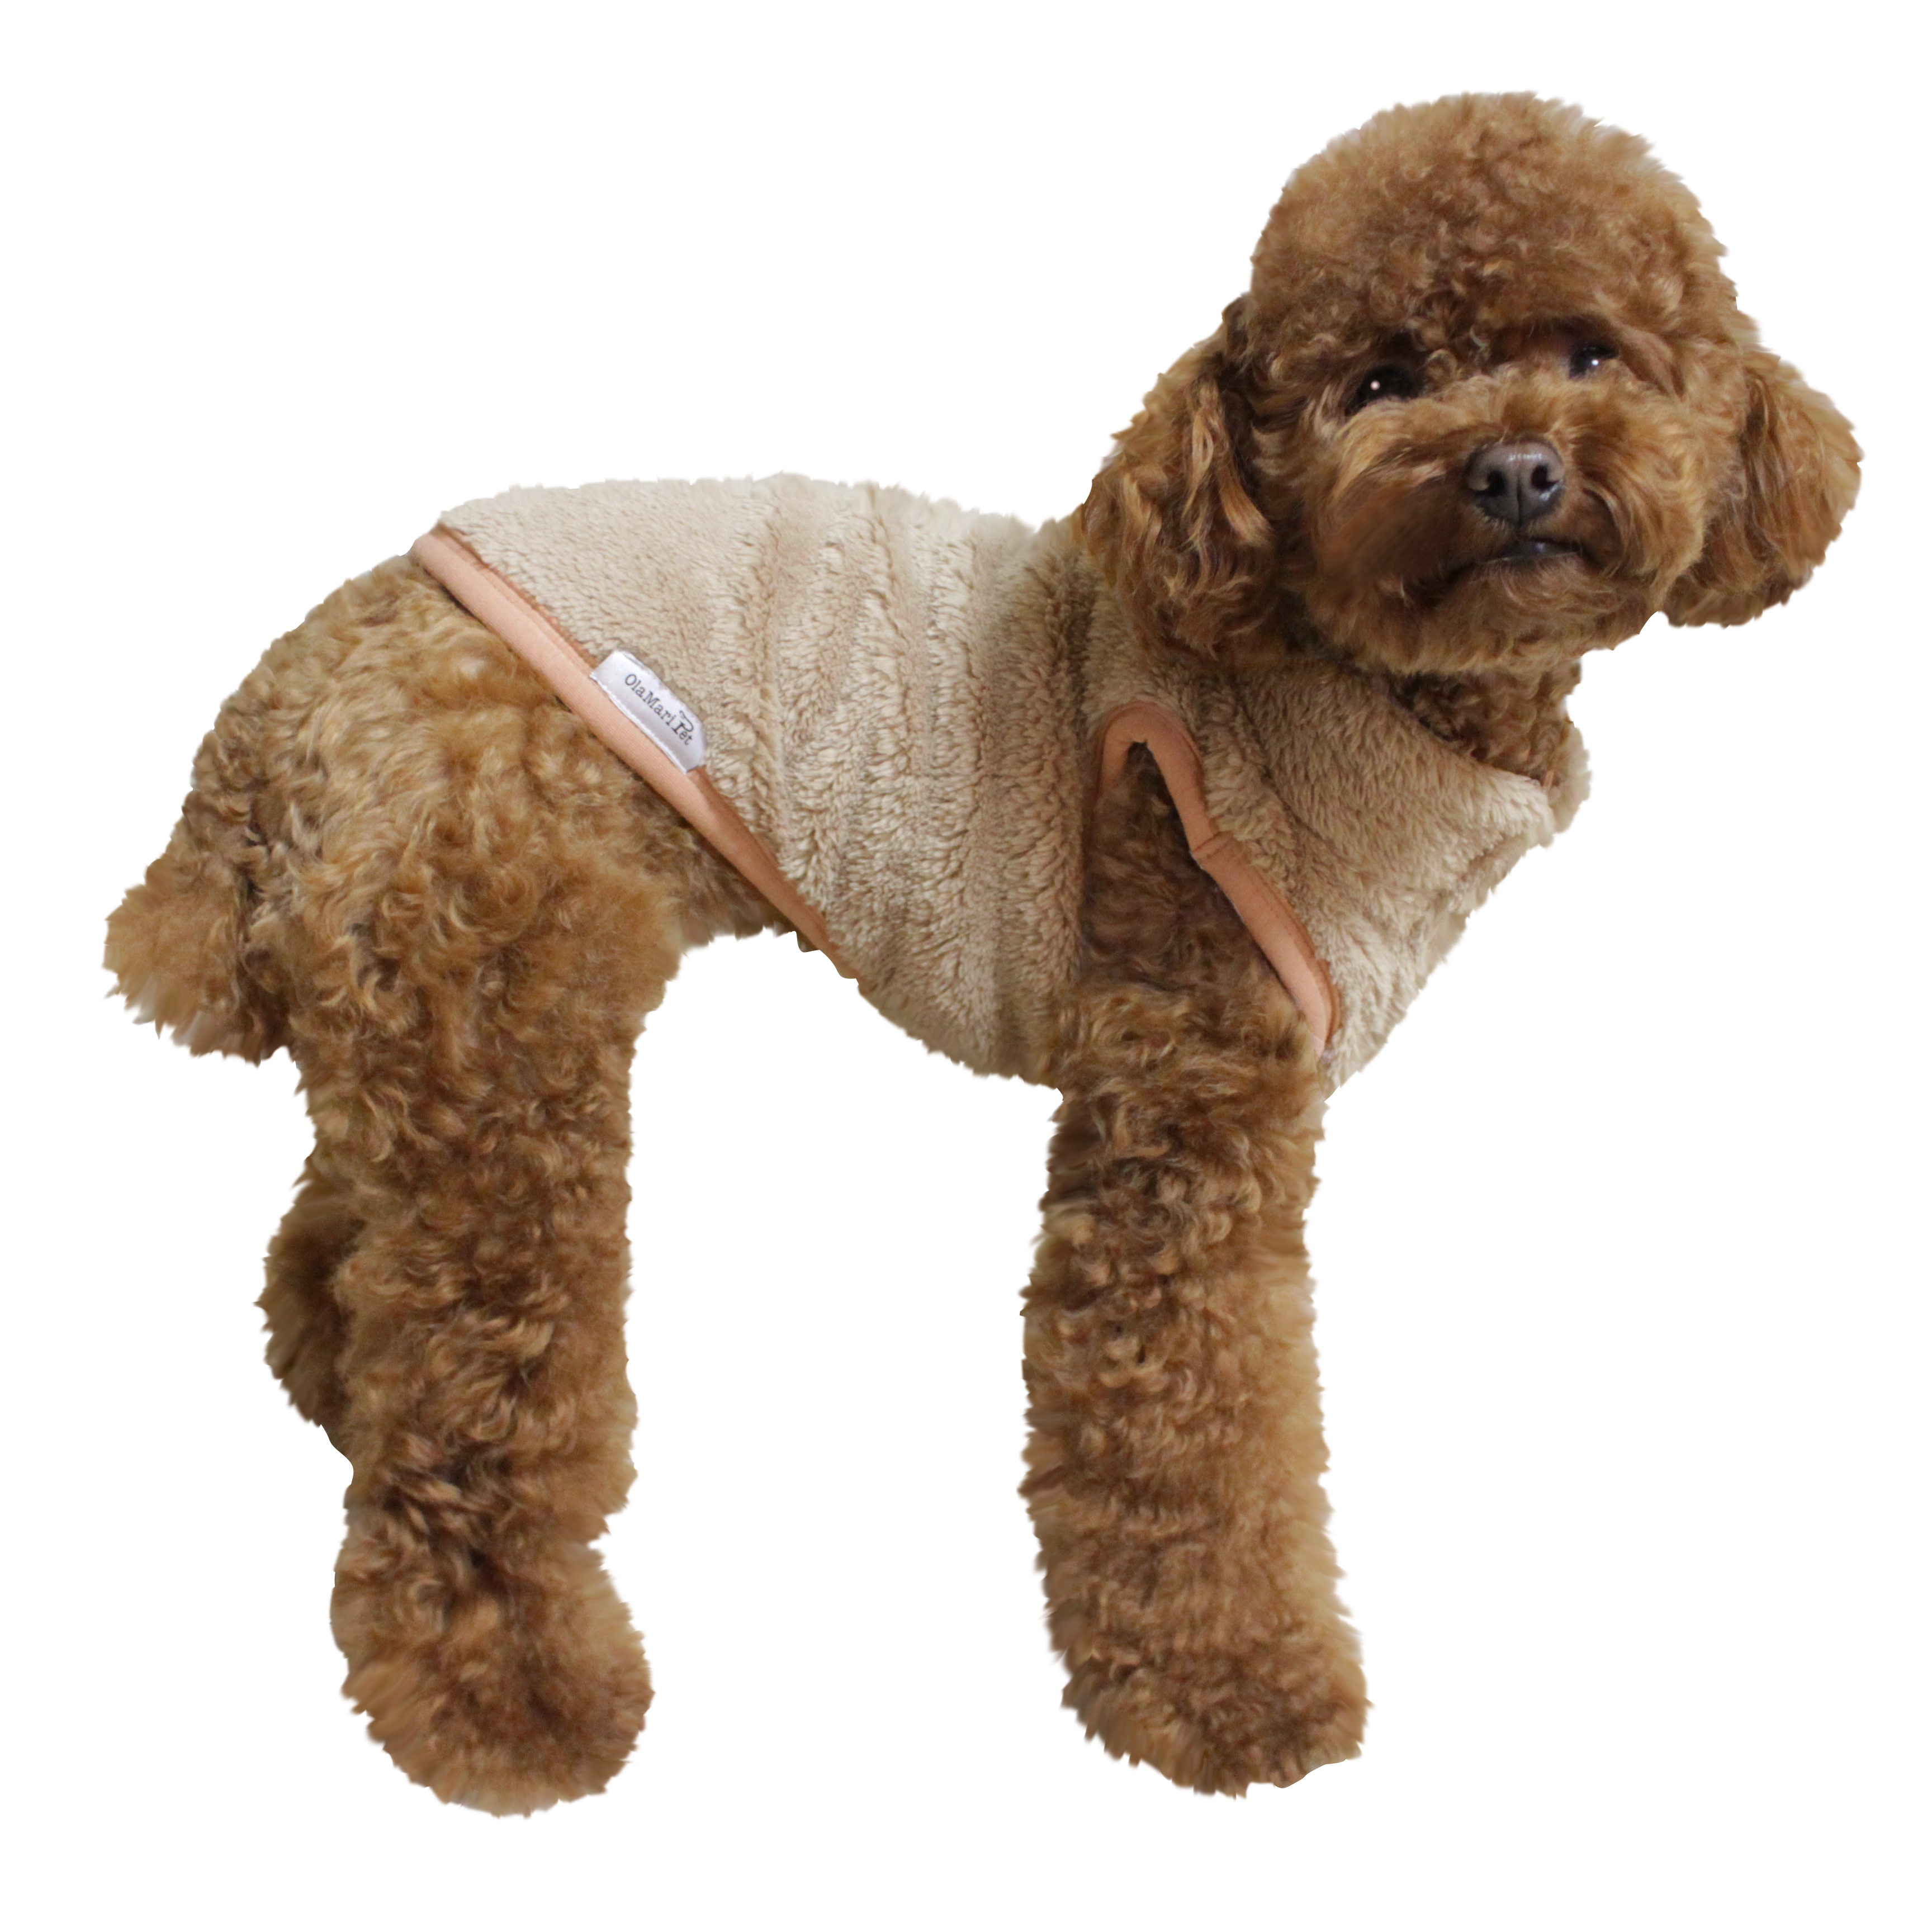 Ola Mari Pet Dog's Super Soft Warm Fleece Zip Up Unisex Vest Sweater For Dogs Pets, Small, Beige